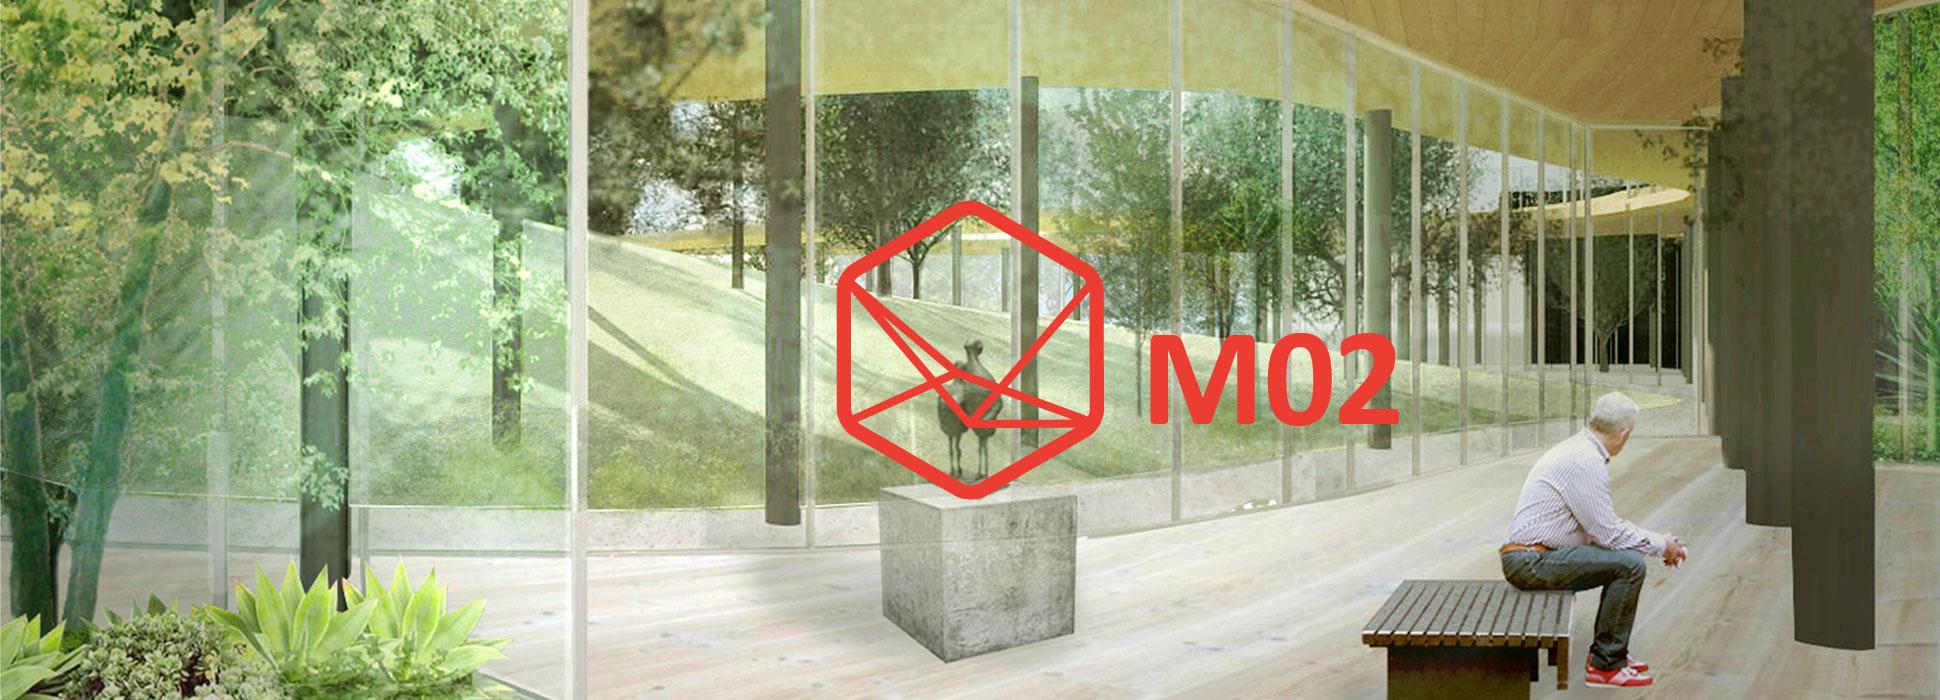 201516_M02-Studio-Projekat_cover